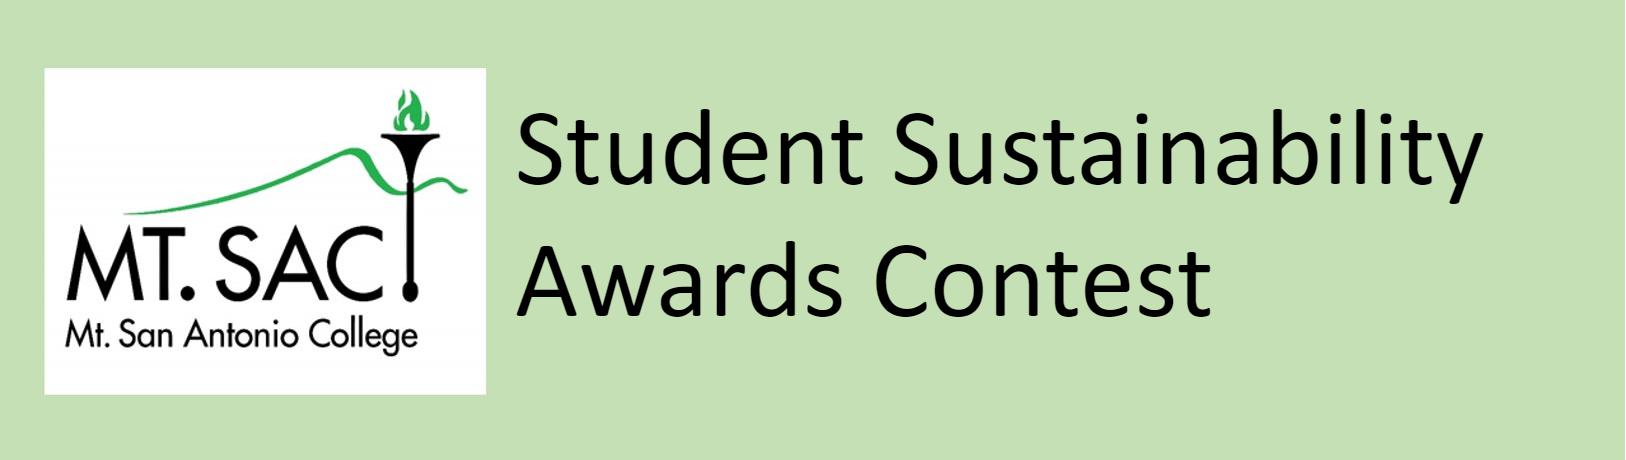 Mt. SAC Student Sustainbability Awards Contest